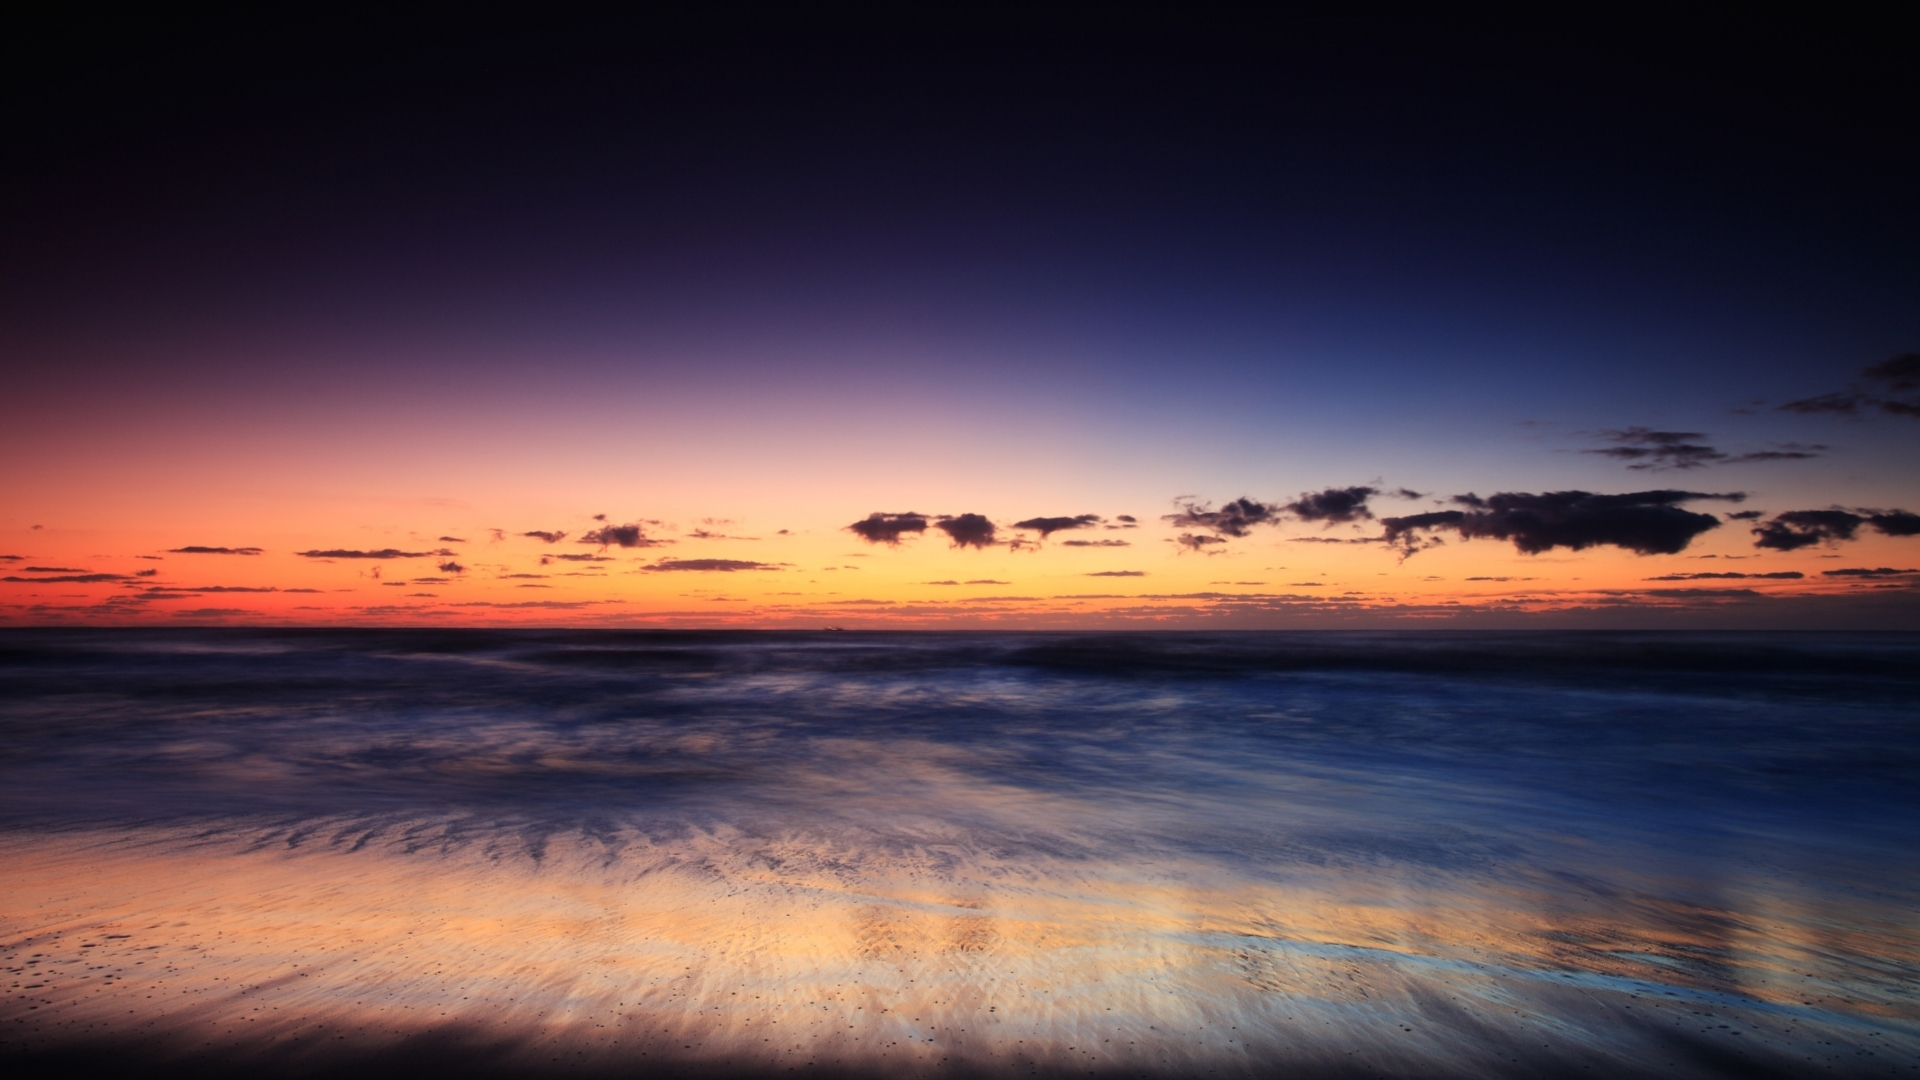 Ocean Beach Mac Wallpaper Download Mac Wallpapers Download 1920x1080